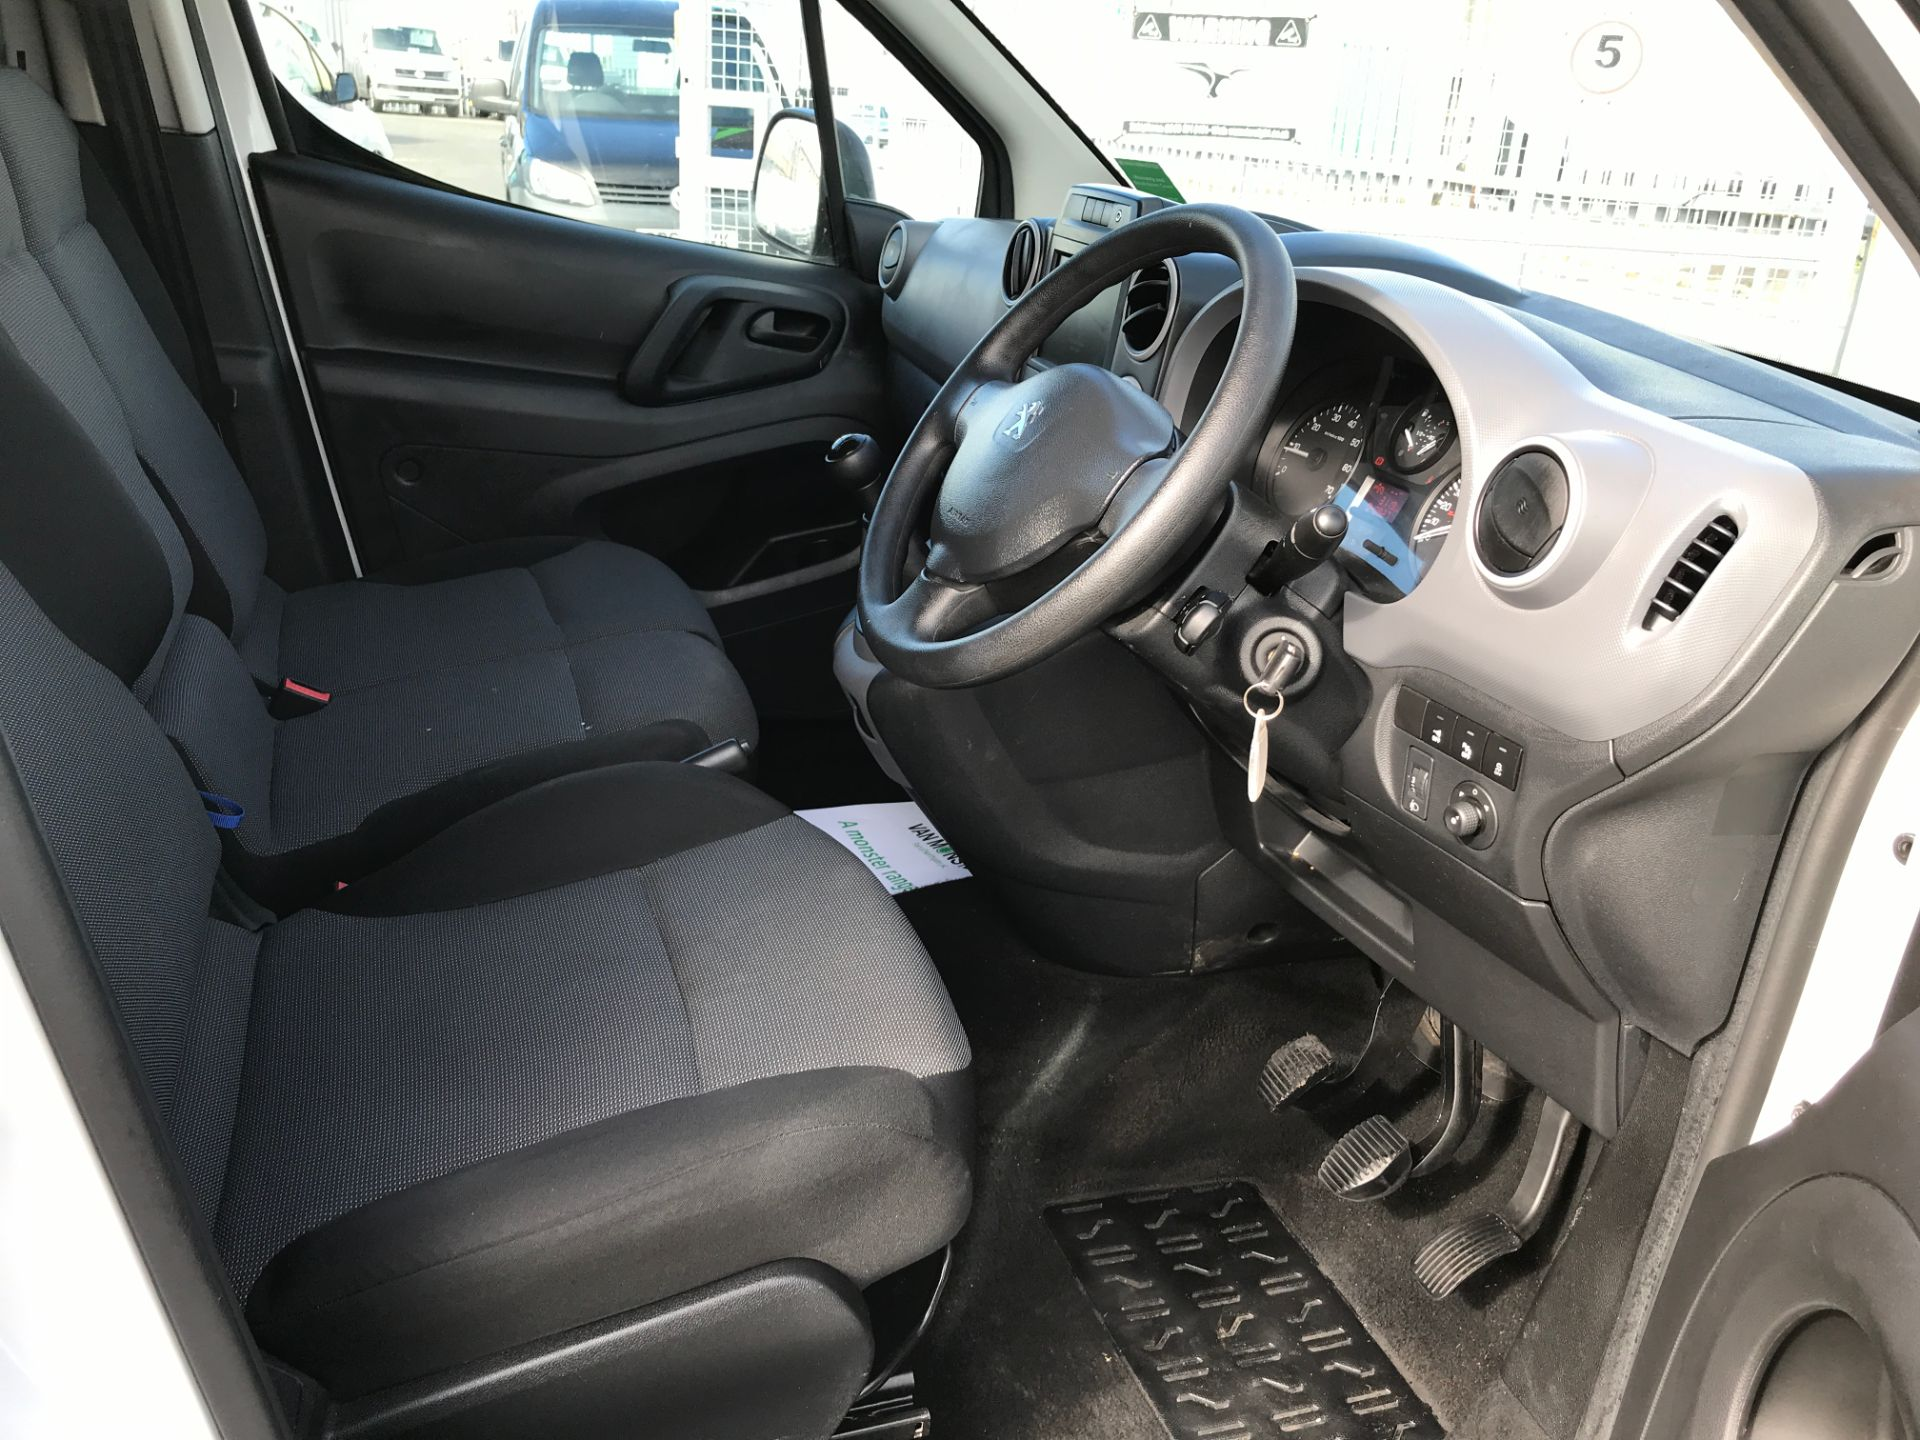 2017 Peugeot Partner L1 850 1.6BLUEHDI 100PS PROFESSIONAL EURO 6 (NU67NRV) Image 2